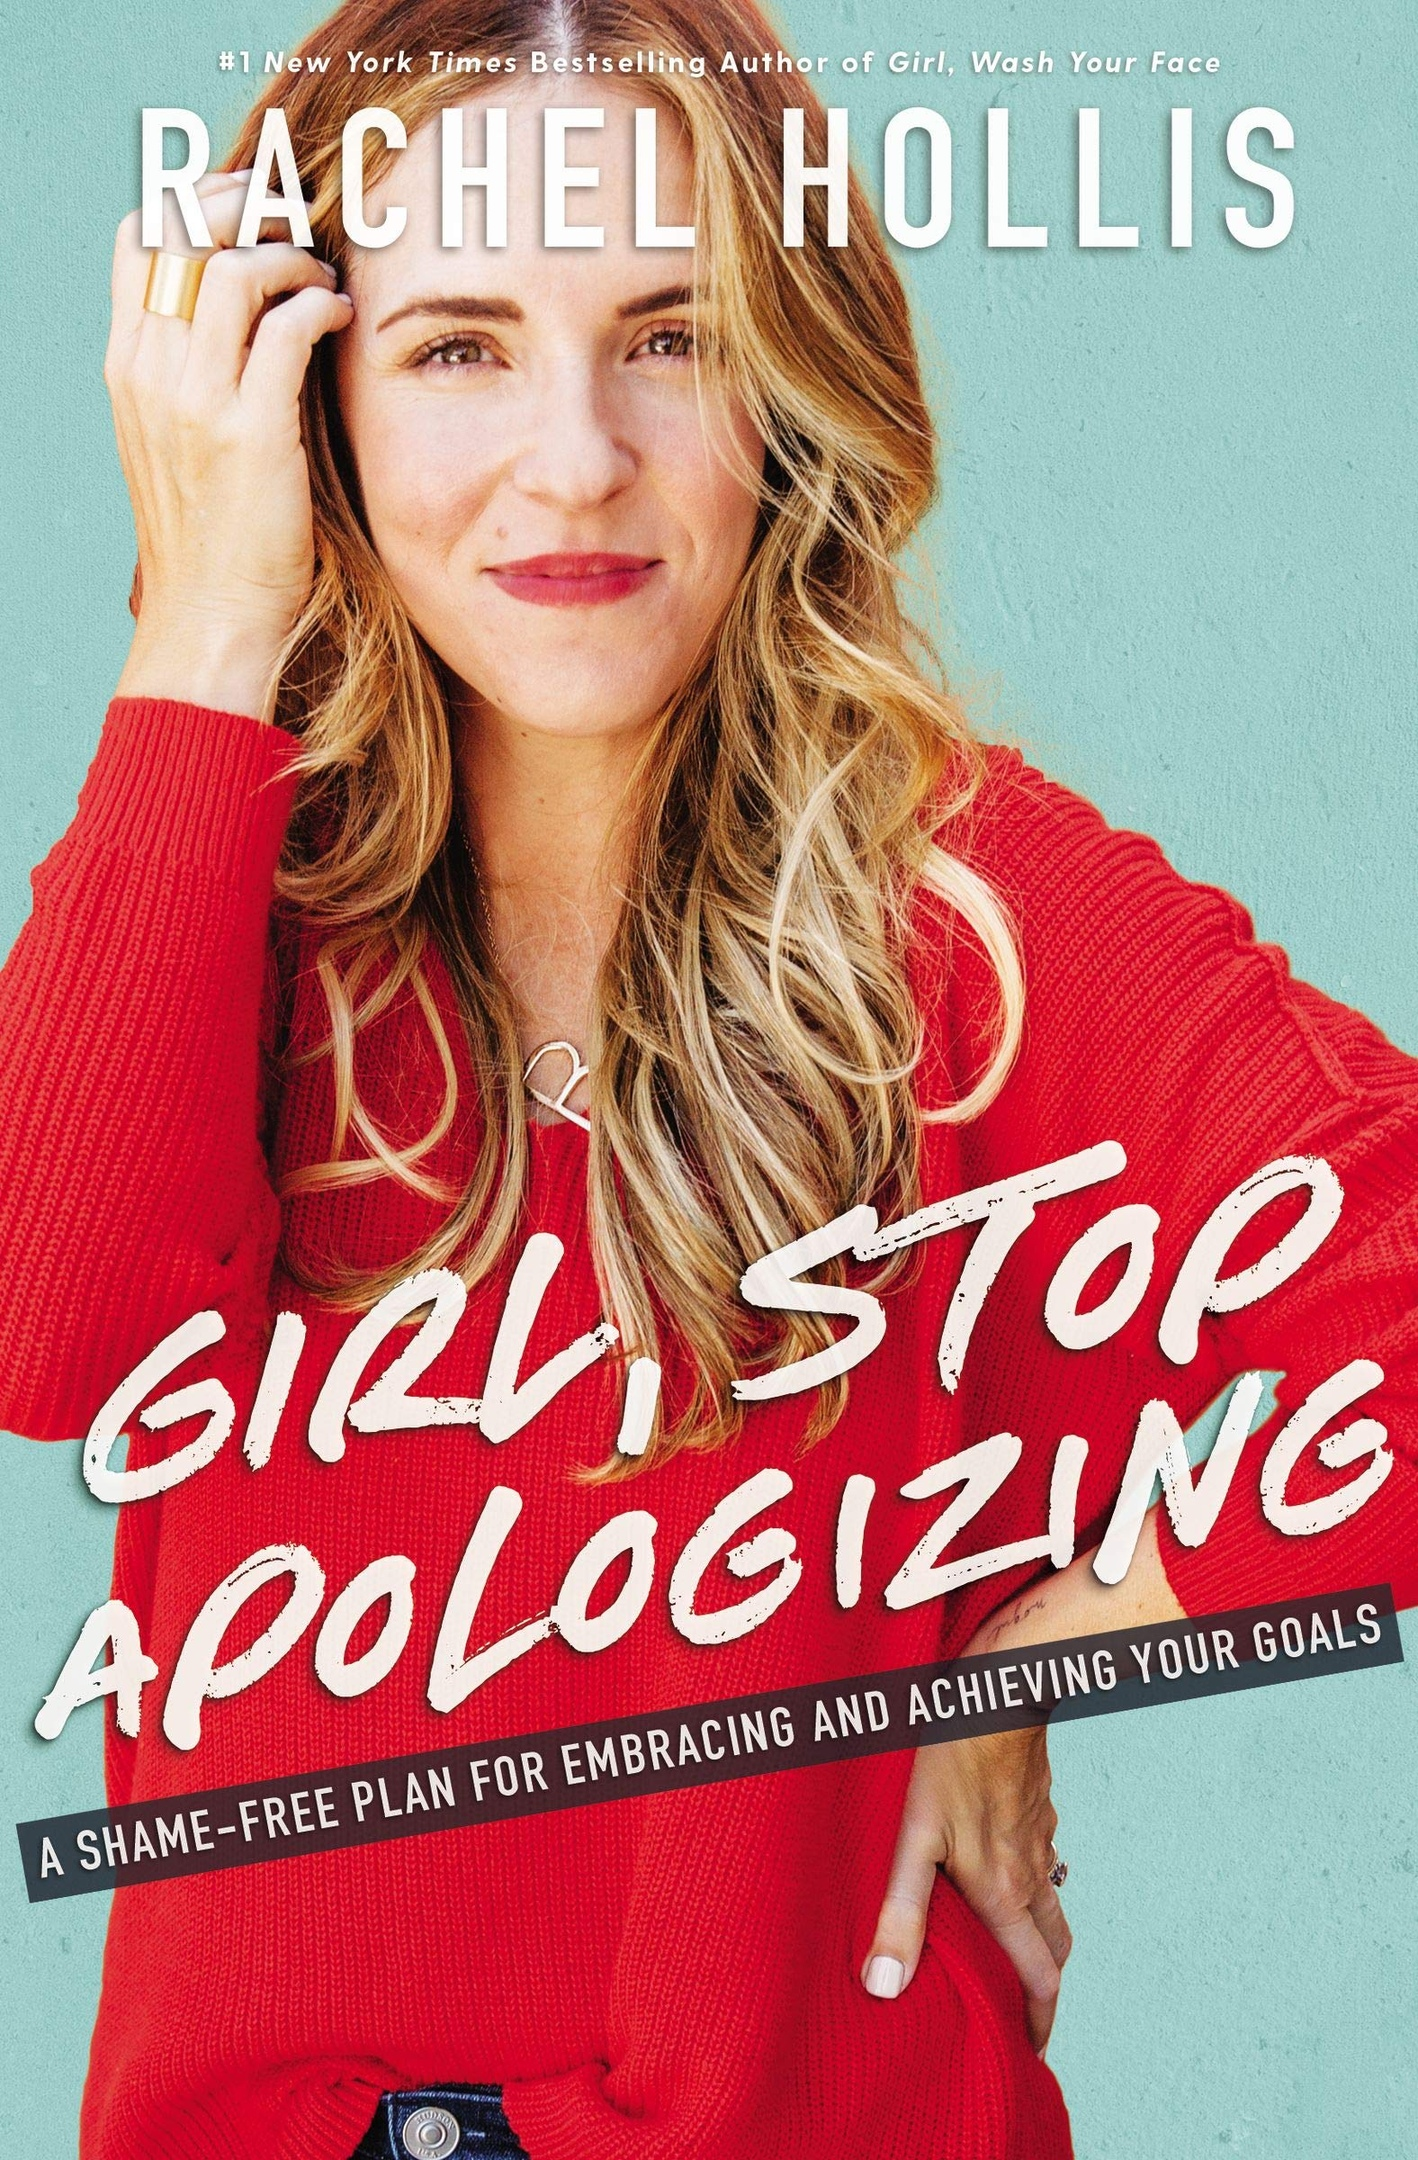 Rachel Hollis – Girl, Stop Apologizing Genre: